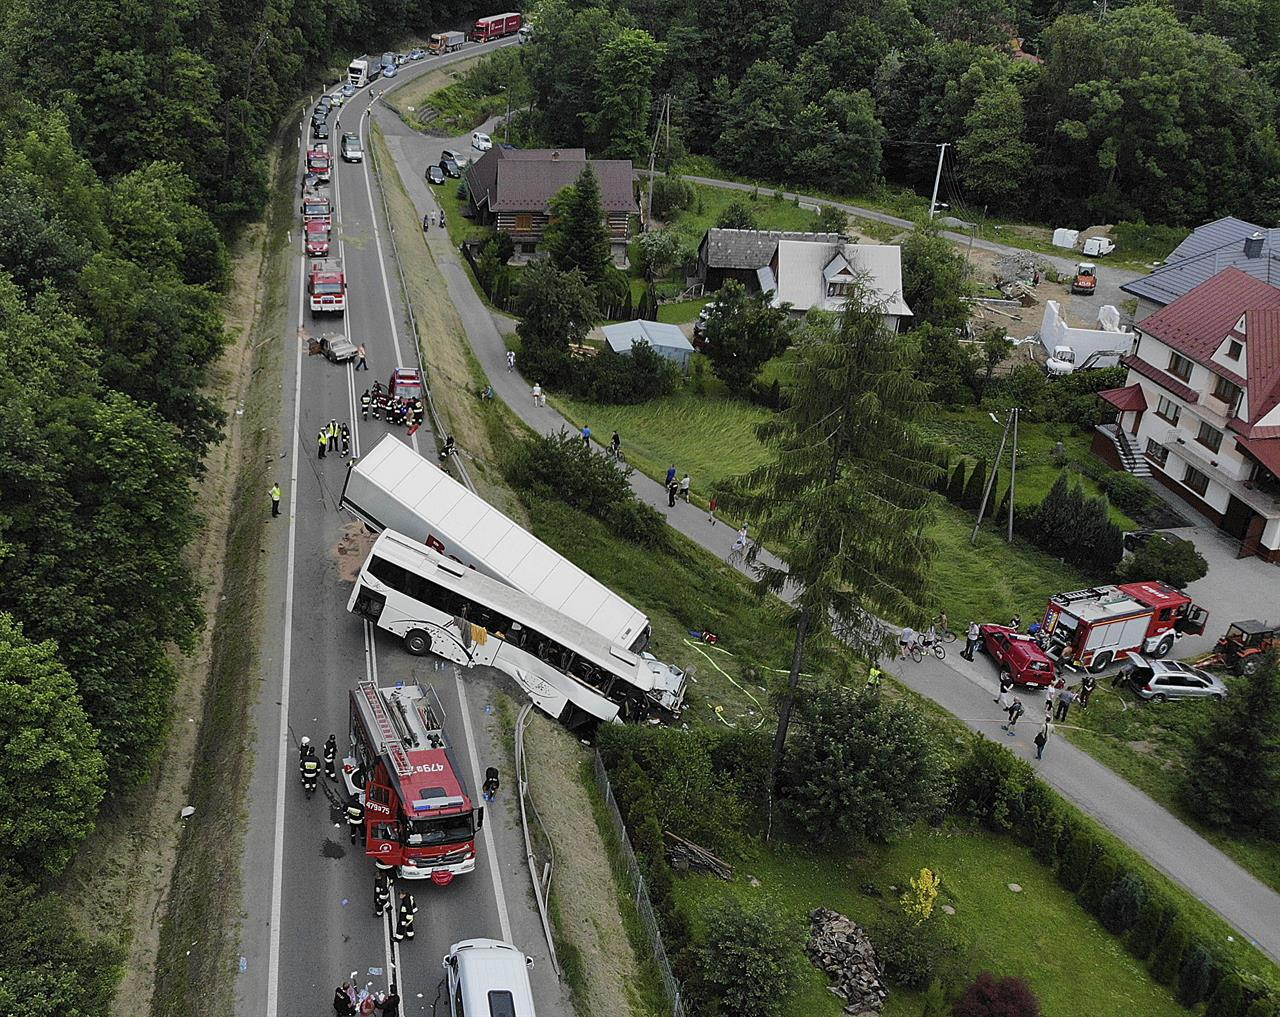 Bus on a school trip crashes in Poland, 49 injured | Money